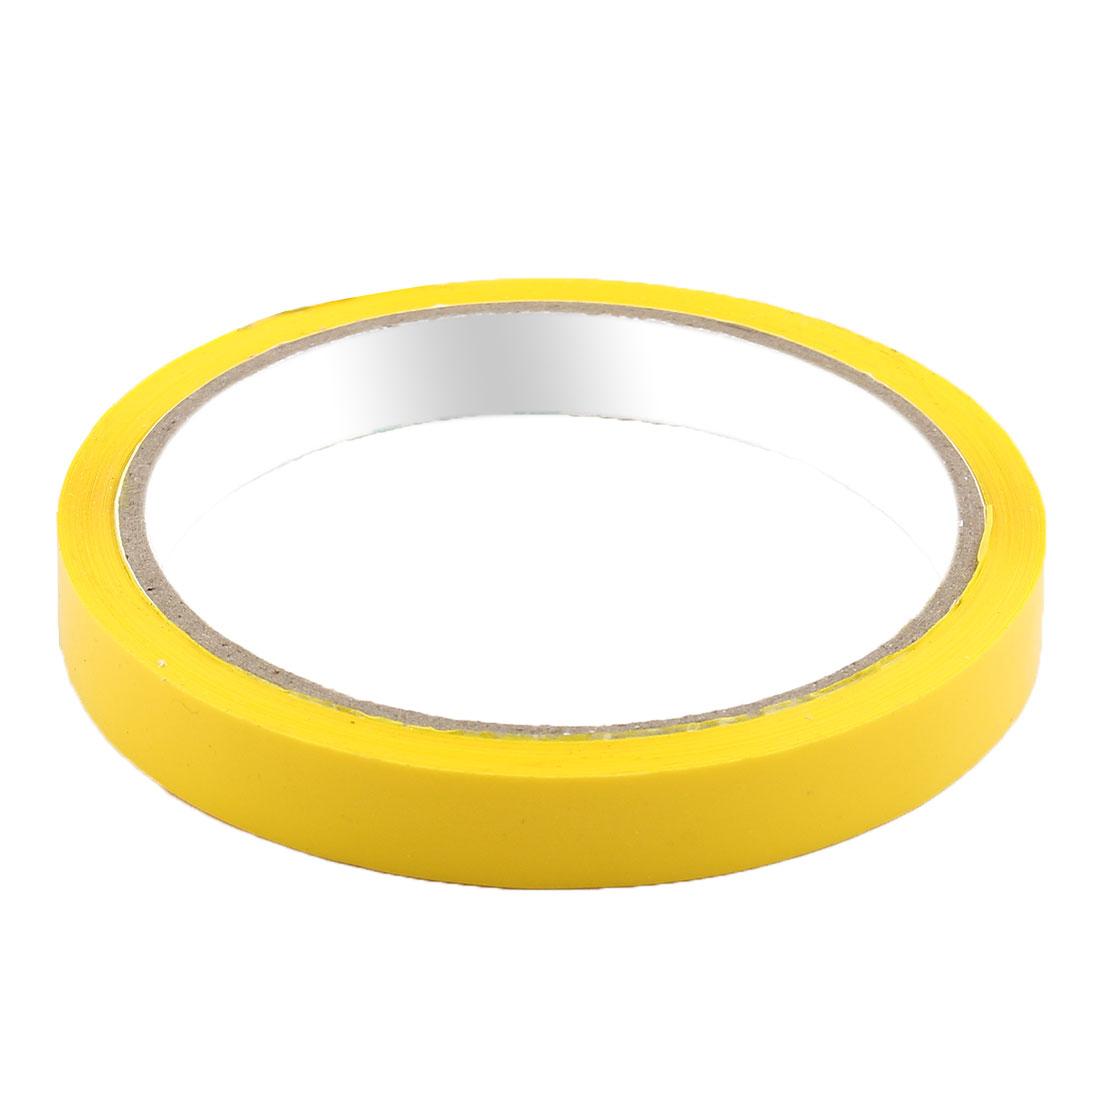 Supermarket PVC Vagetable Bag Neck Sealing Adhesive Tape Yellow 1.2cm Width 2pcs